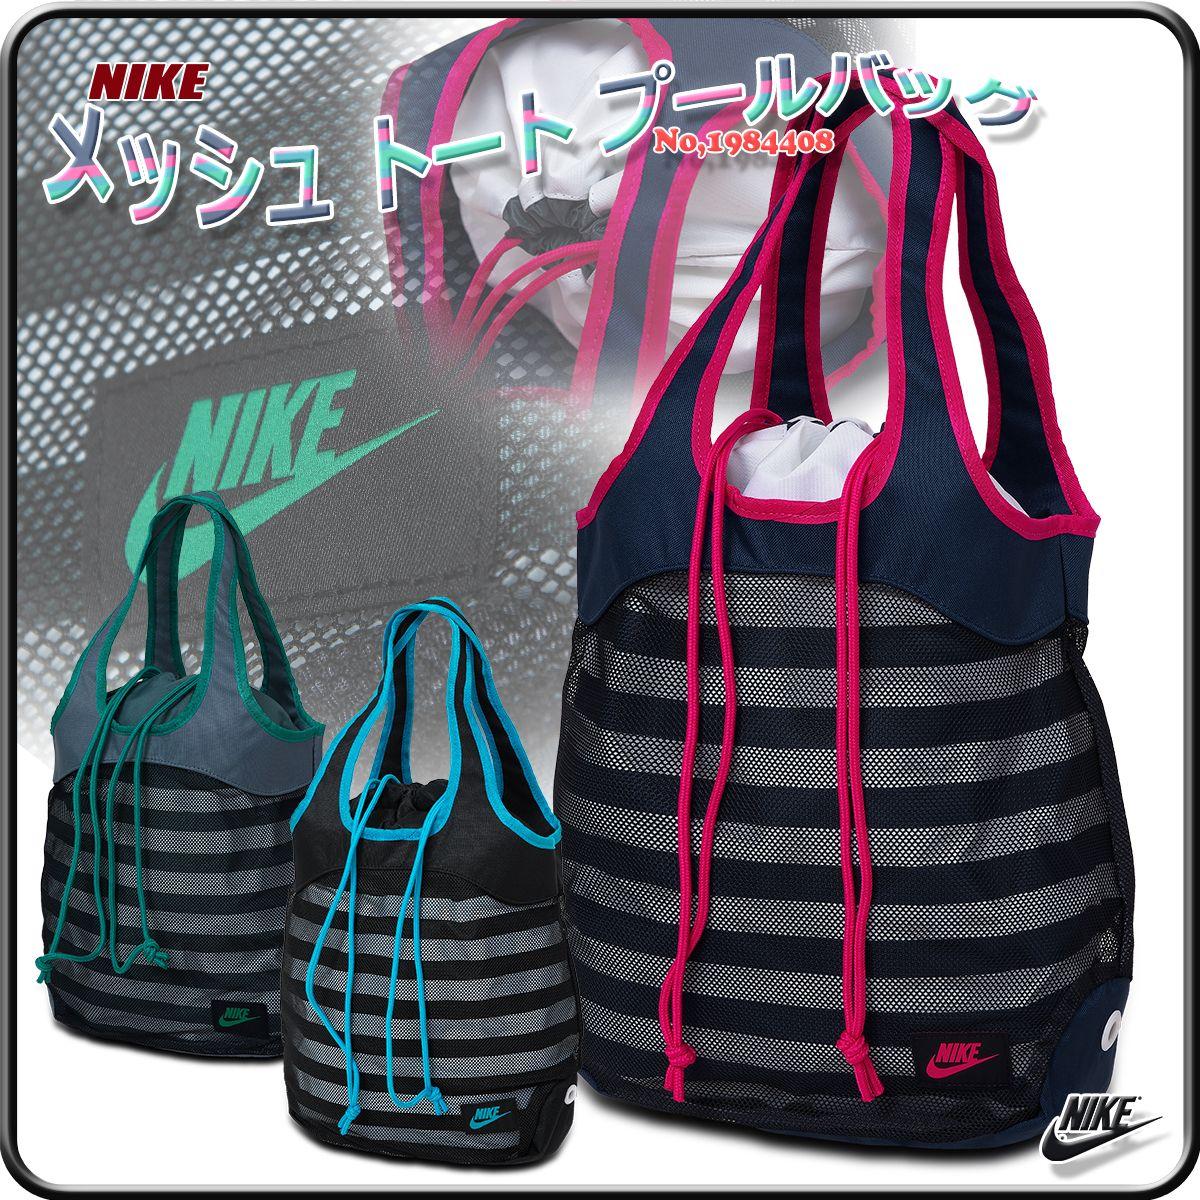 a2f3dd5eaa159 Poolbeg Nike swim bag ladies tote bag border pattern swimming bag for  swimming women s NIKE   mesh Tote pullback No